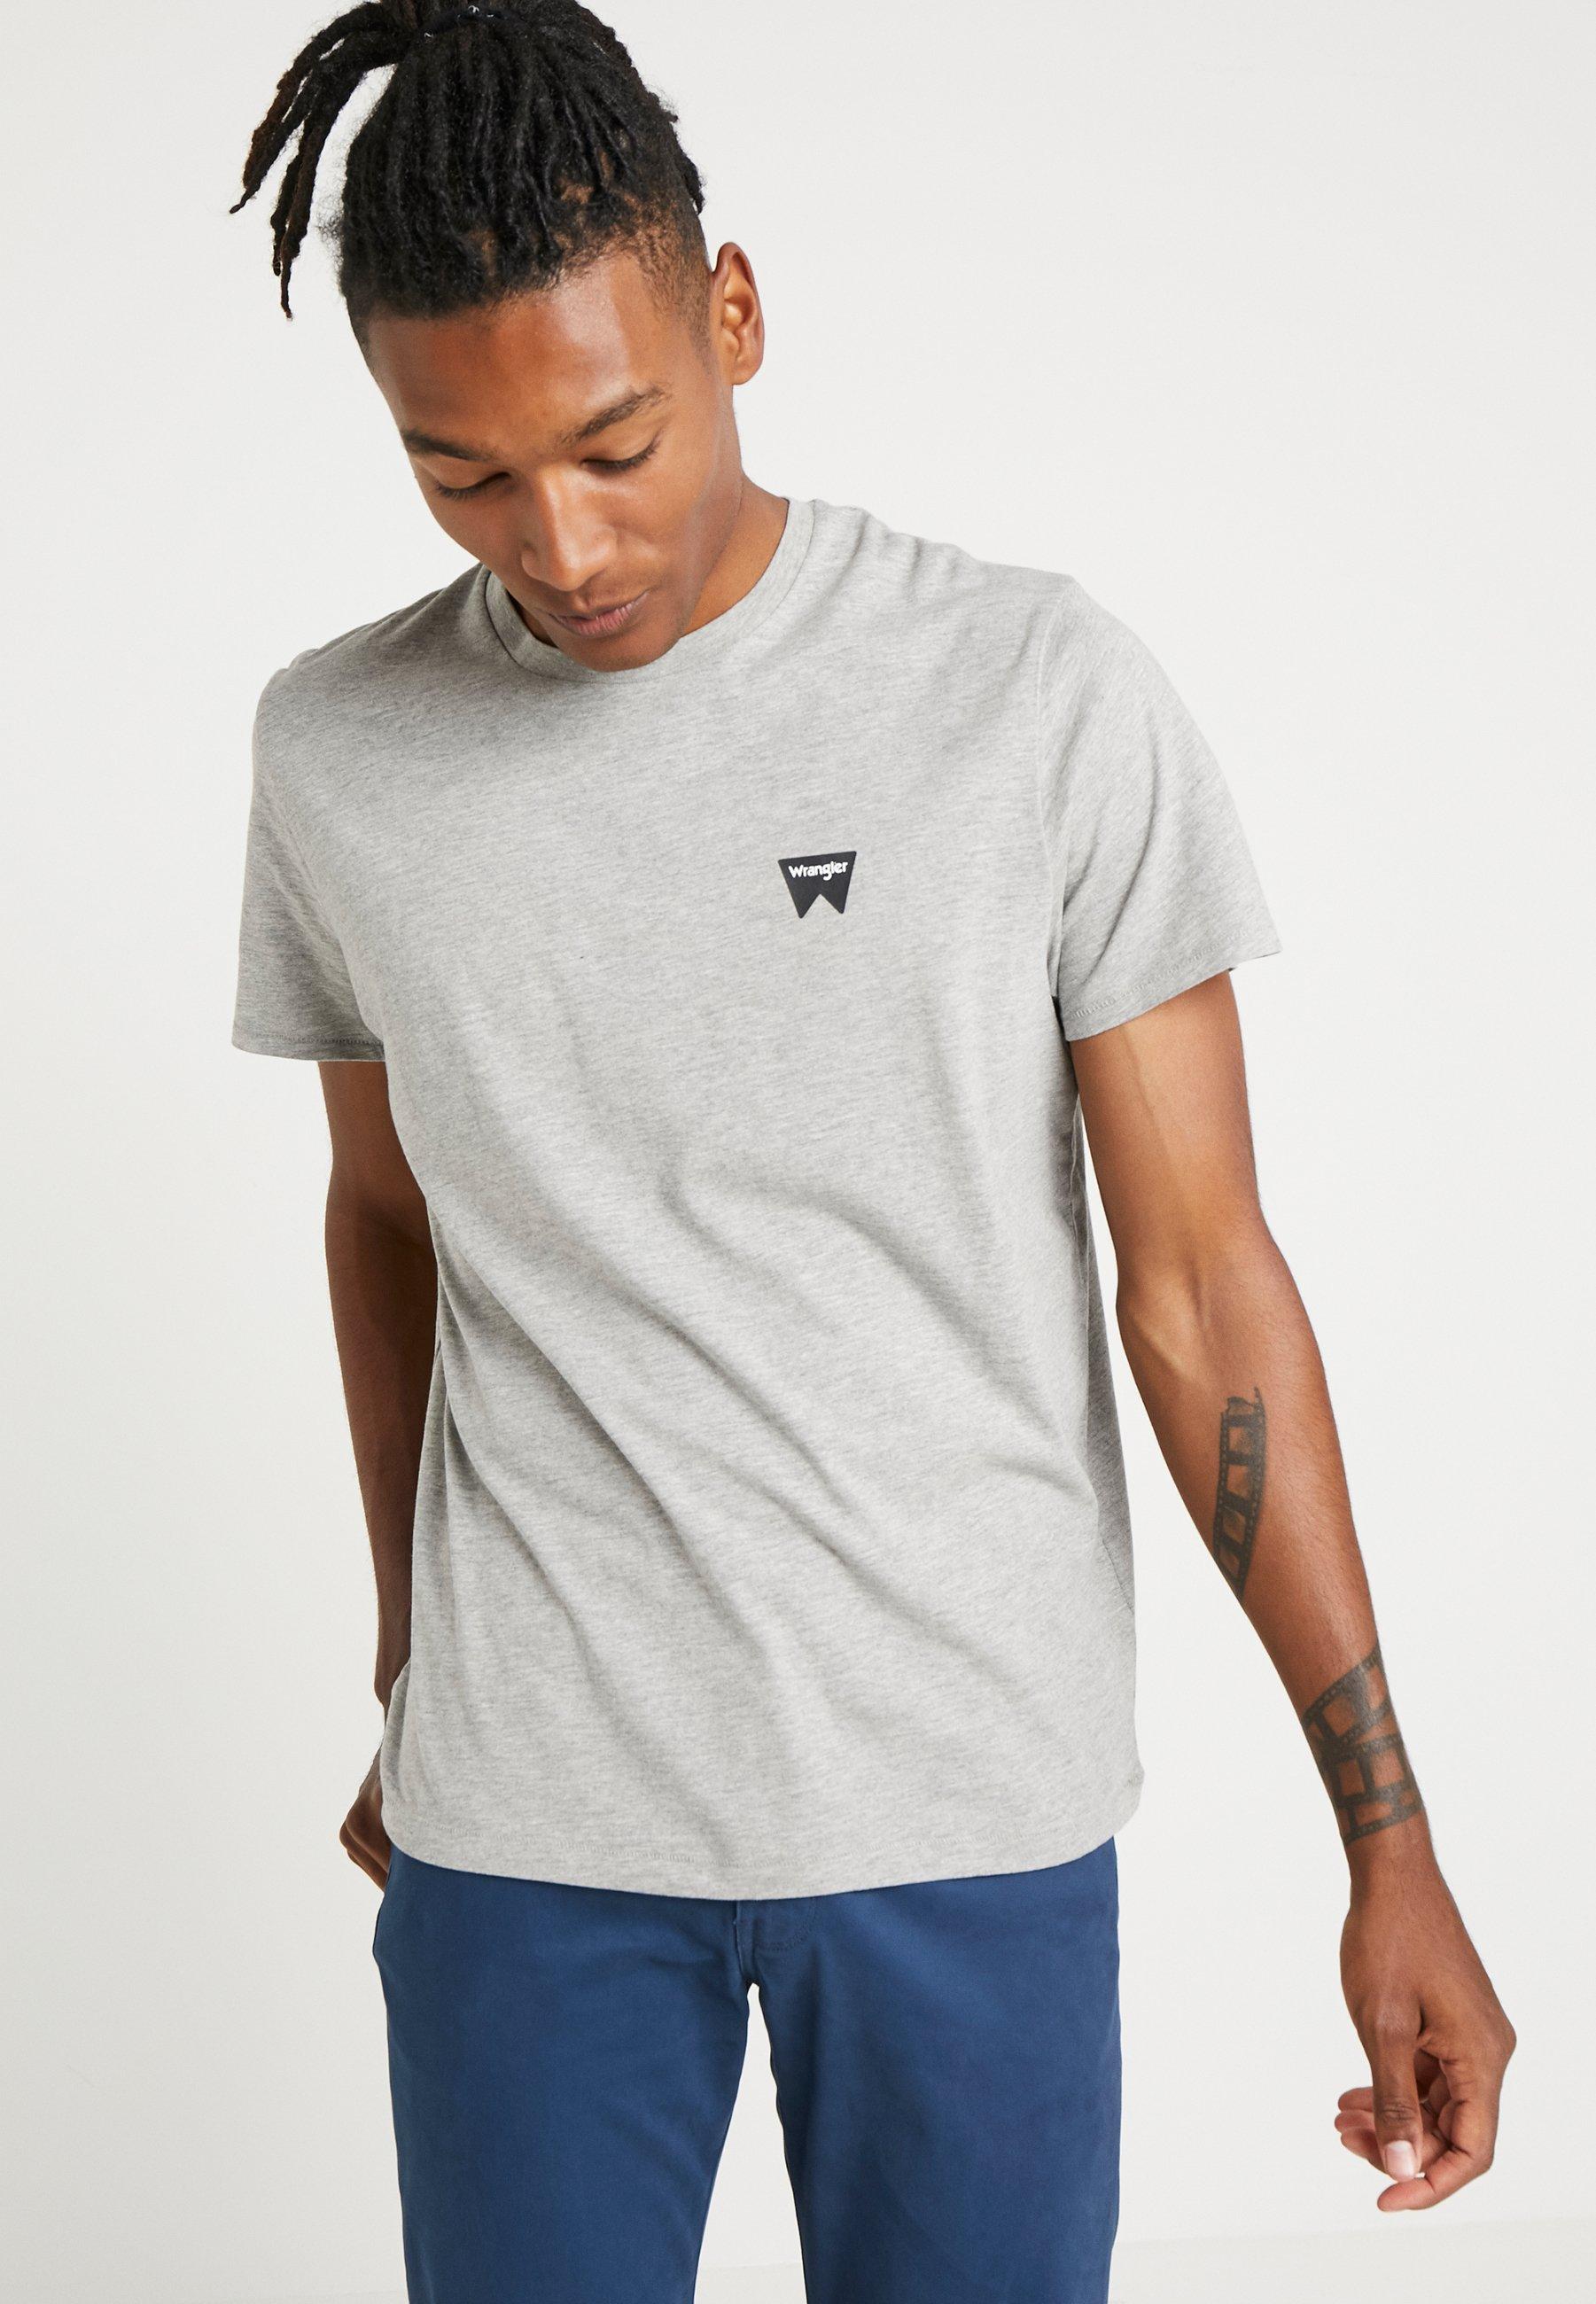 Homme SIGN OFF - T-shirt basique